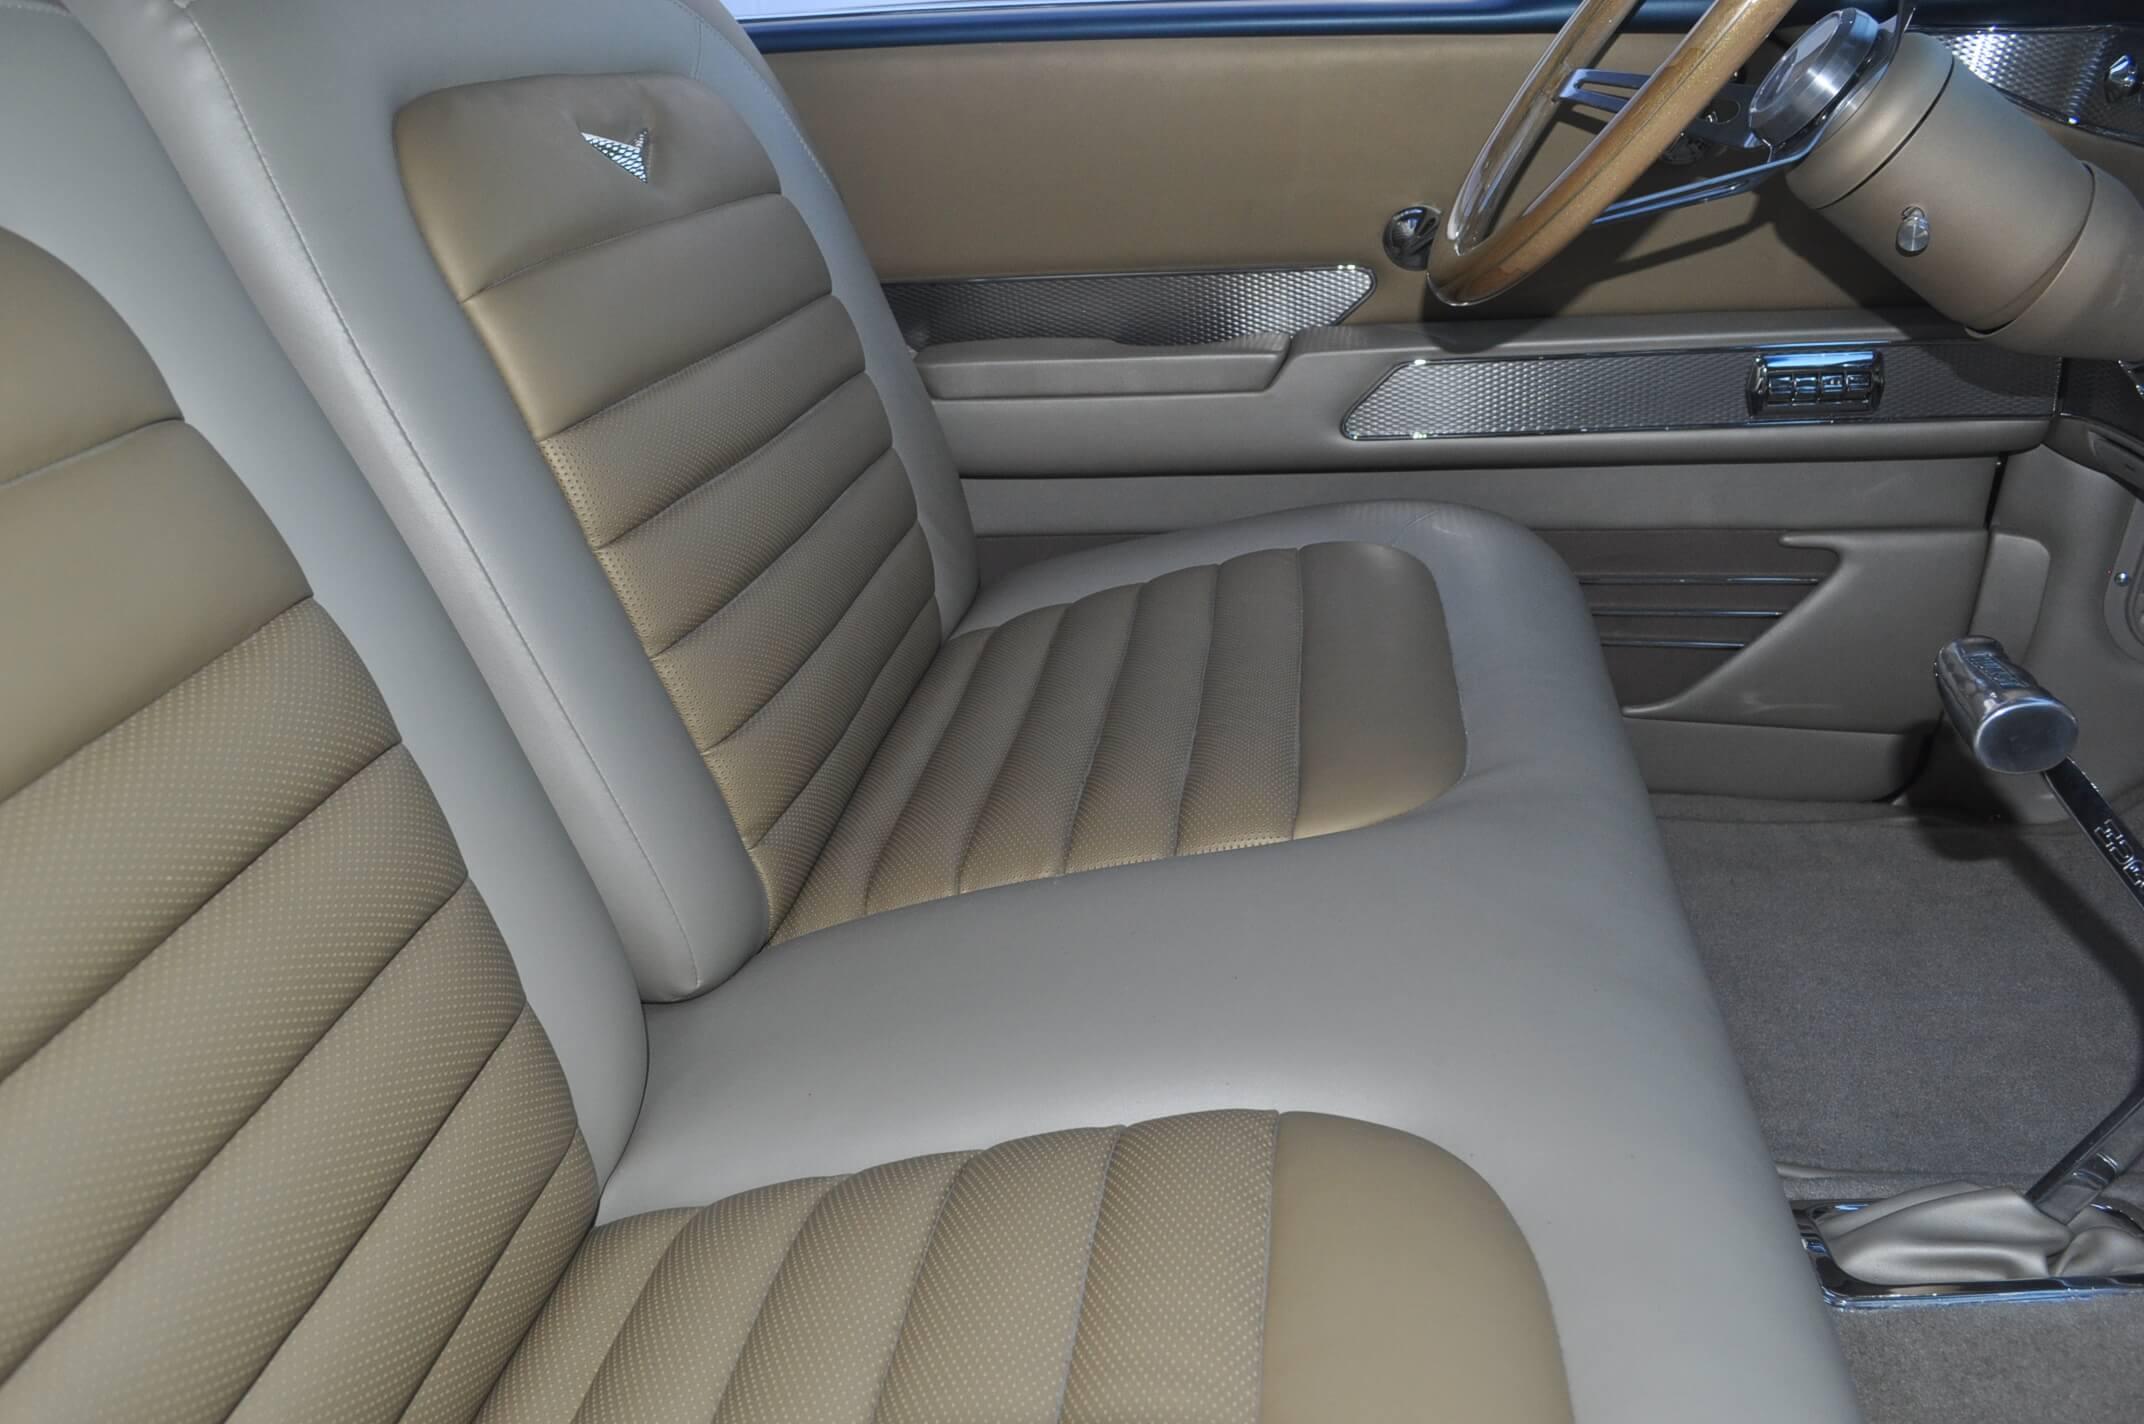 paul 39 s 55 chevy bel air kidd darrin 39 s custom cars. Black Bedroom Furniture Sets. Home Design Ideas